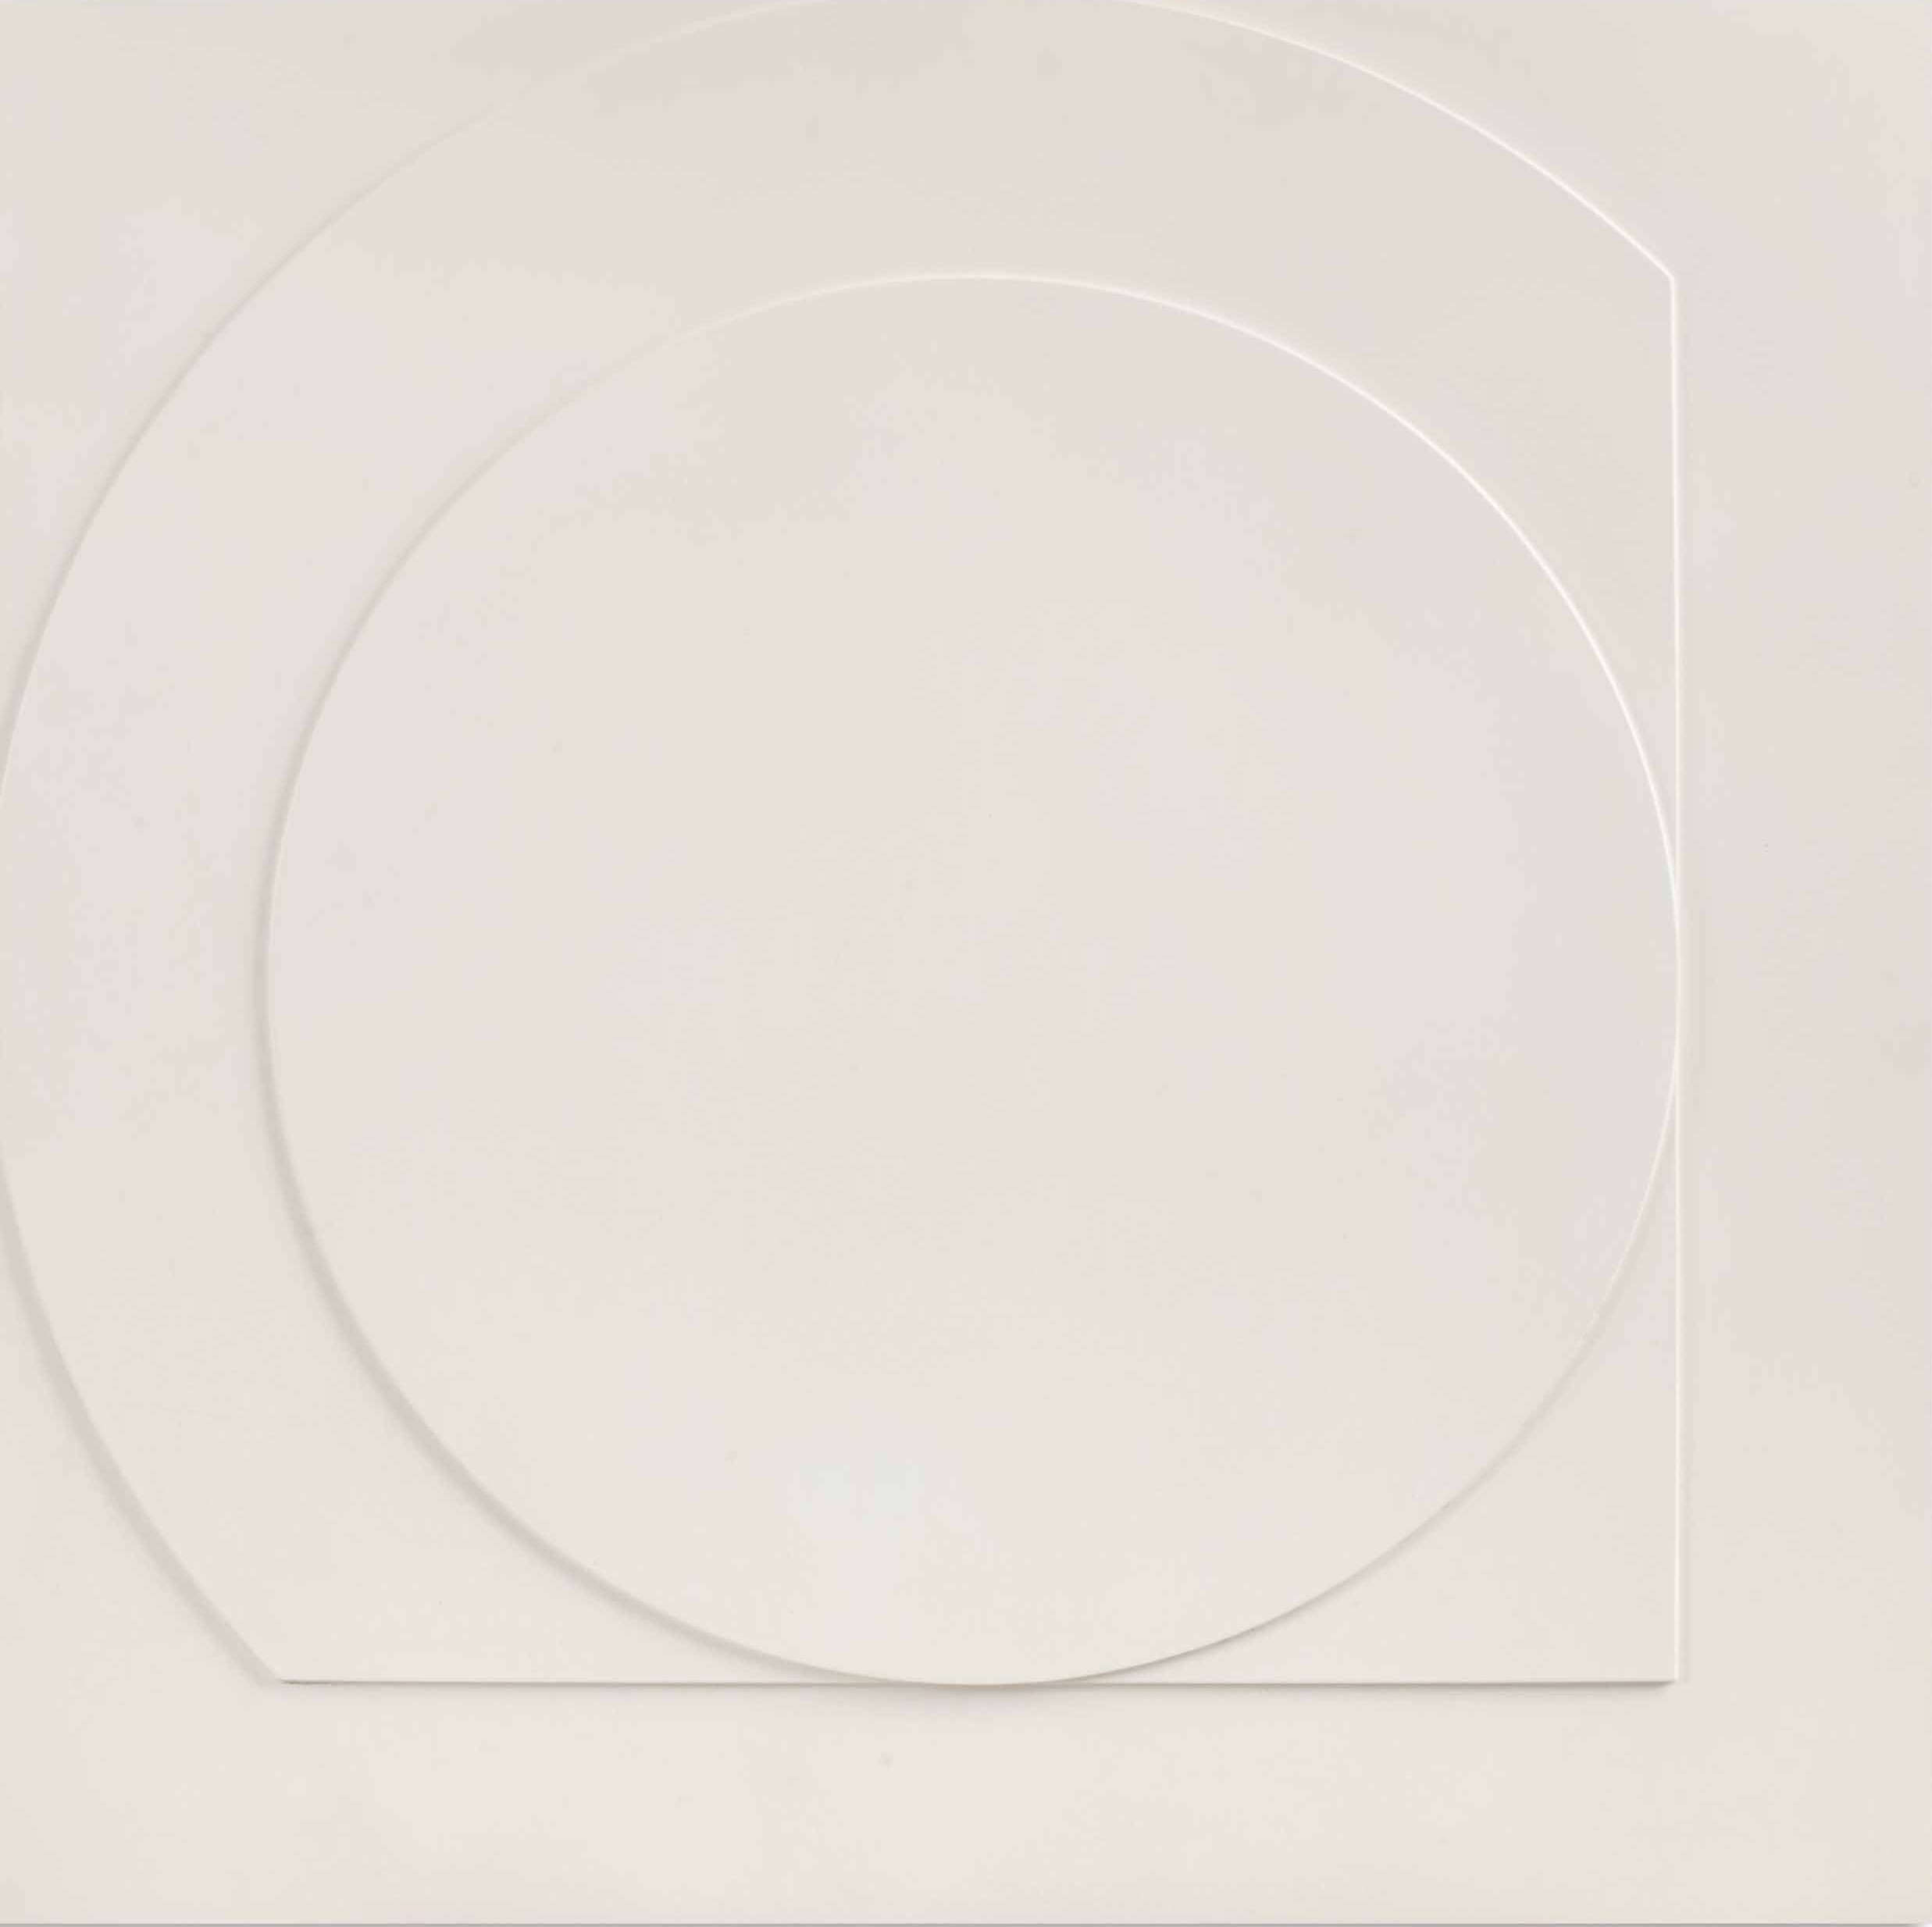 Ad Dekkers, Vierkant en cirkel in overgang, 1967, Borzo Galerie